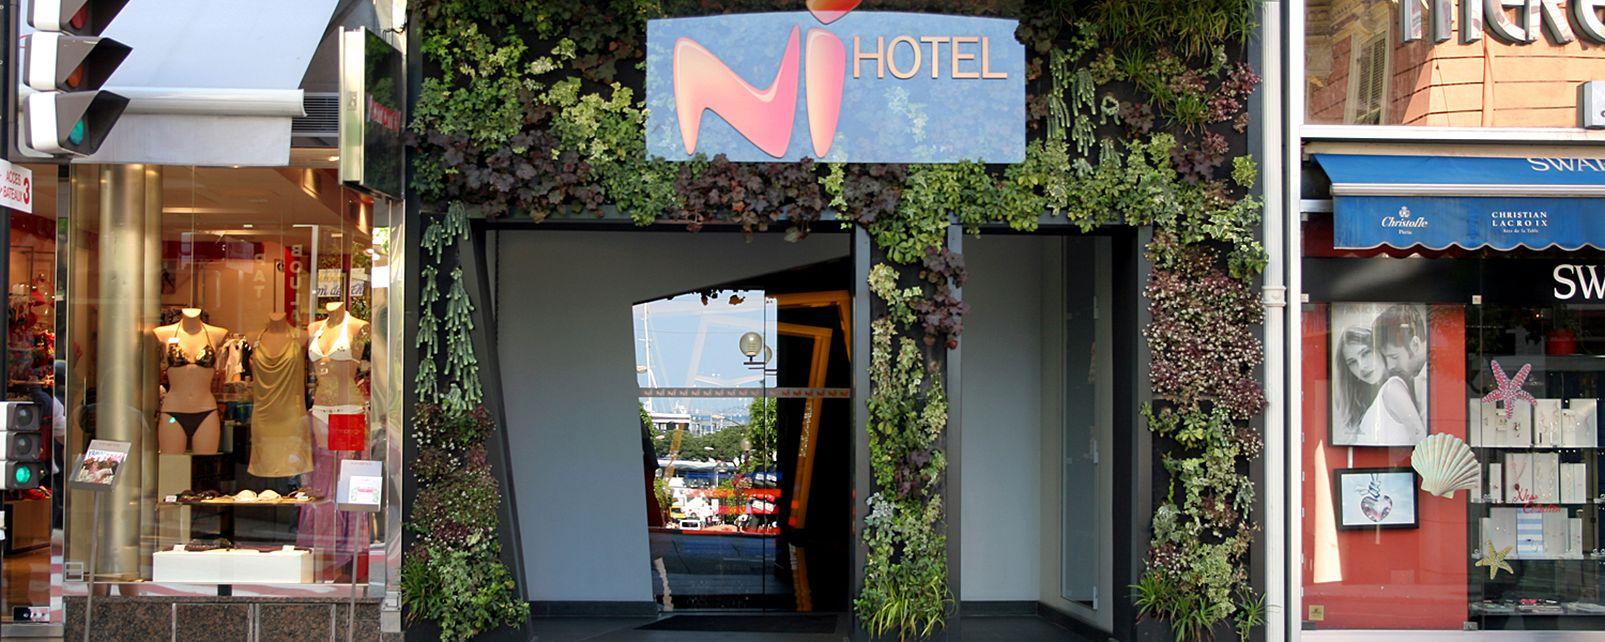 Hotel Ni Hotel